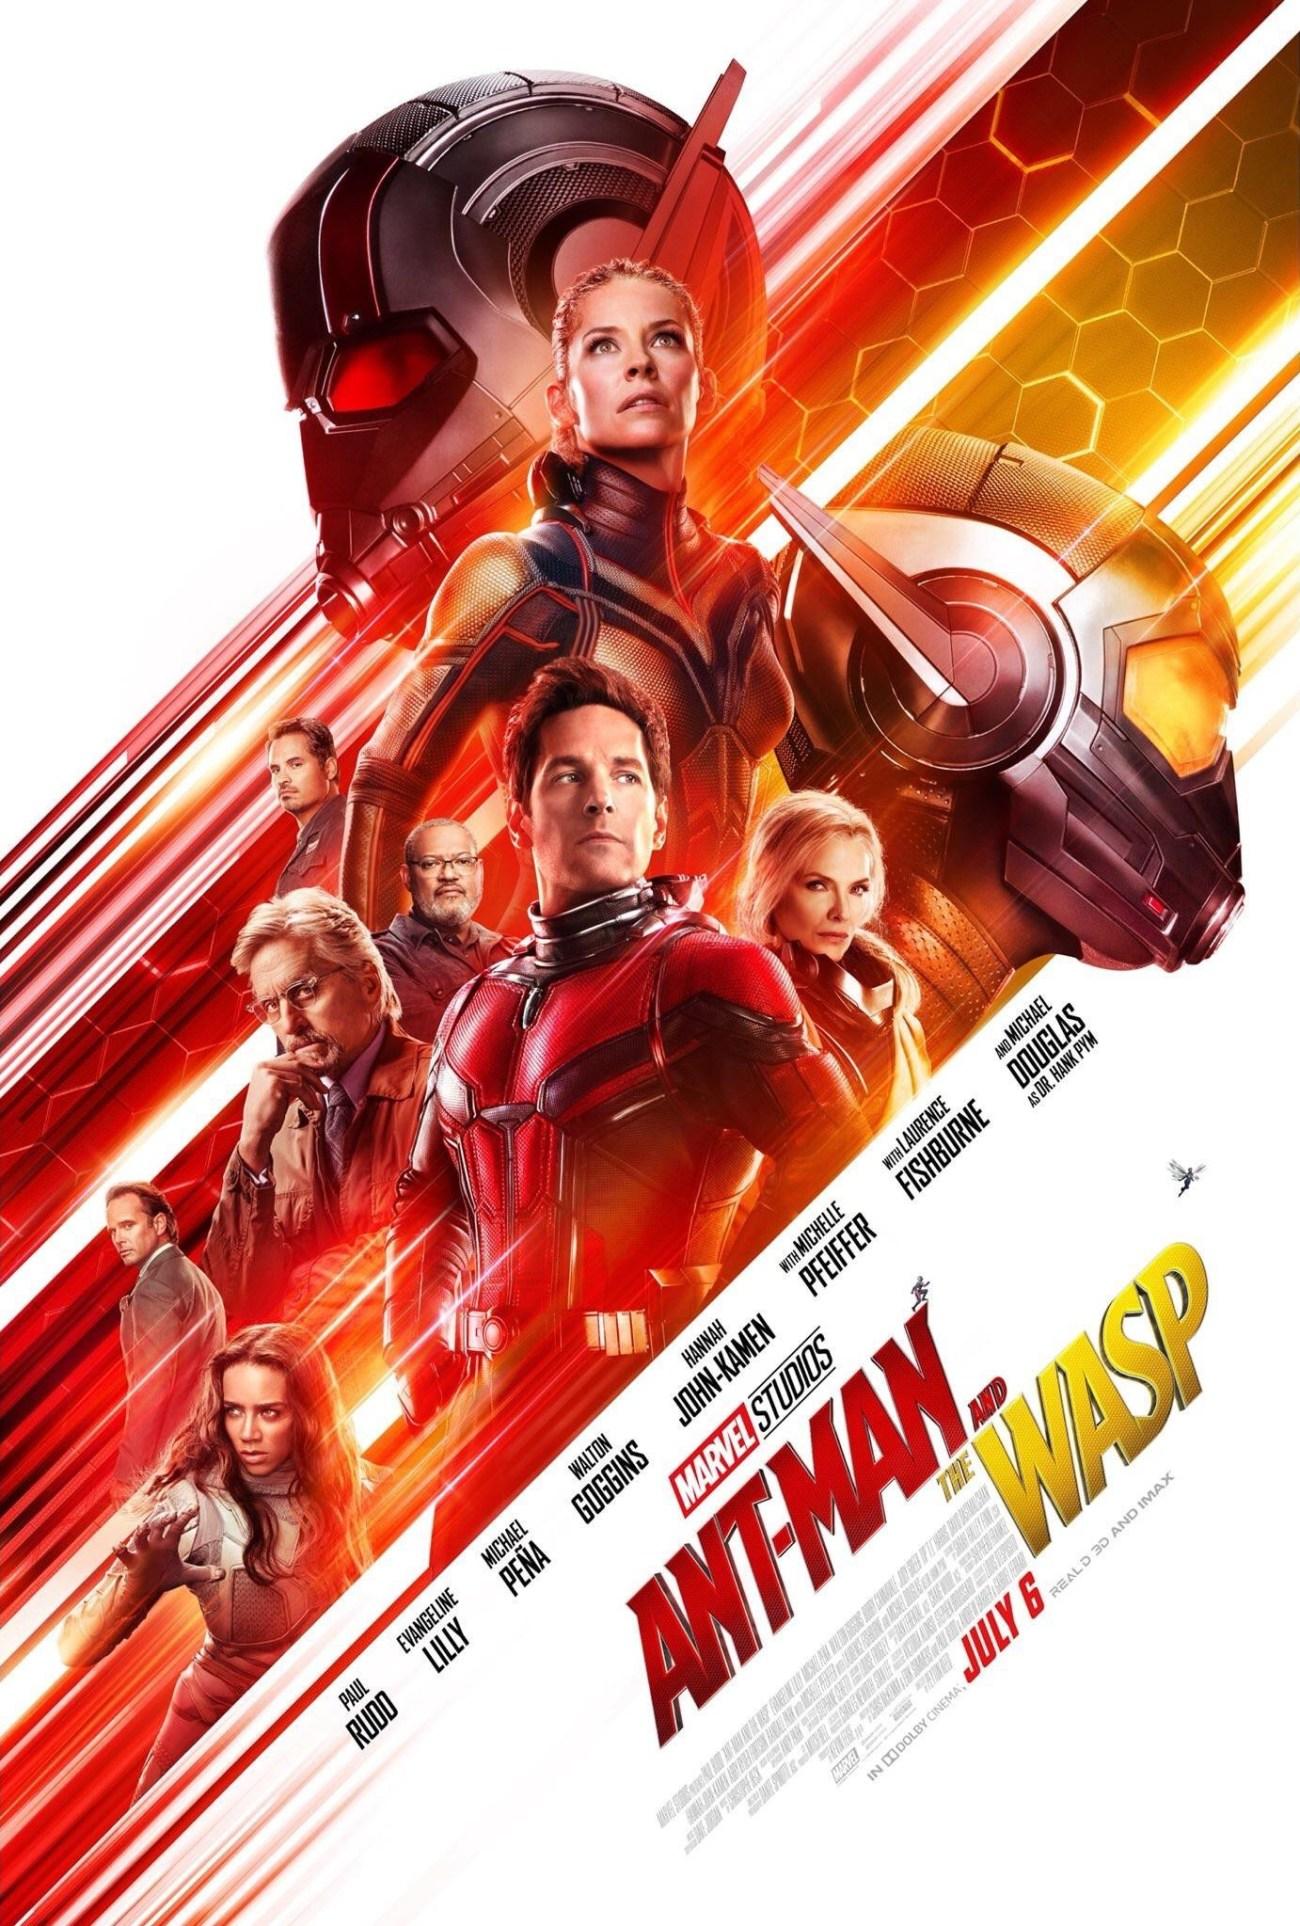 Póster de Ant-Man and the Wasp (2018). Imagen: impawards.com